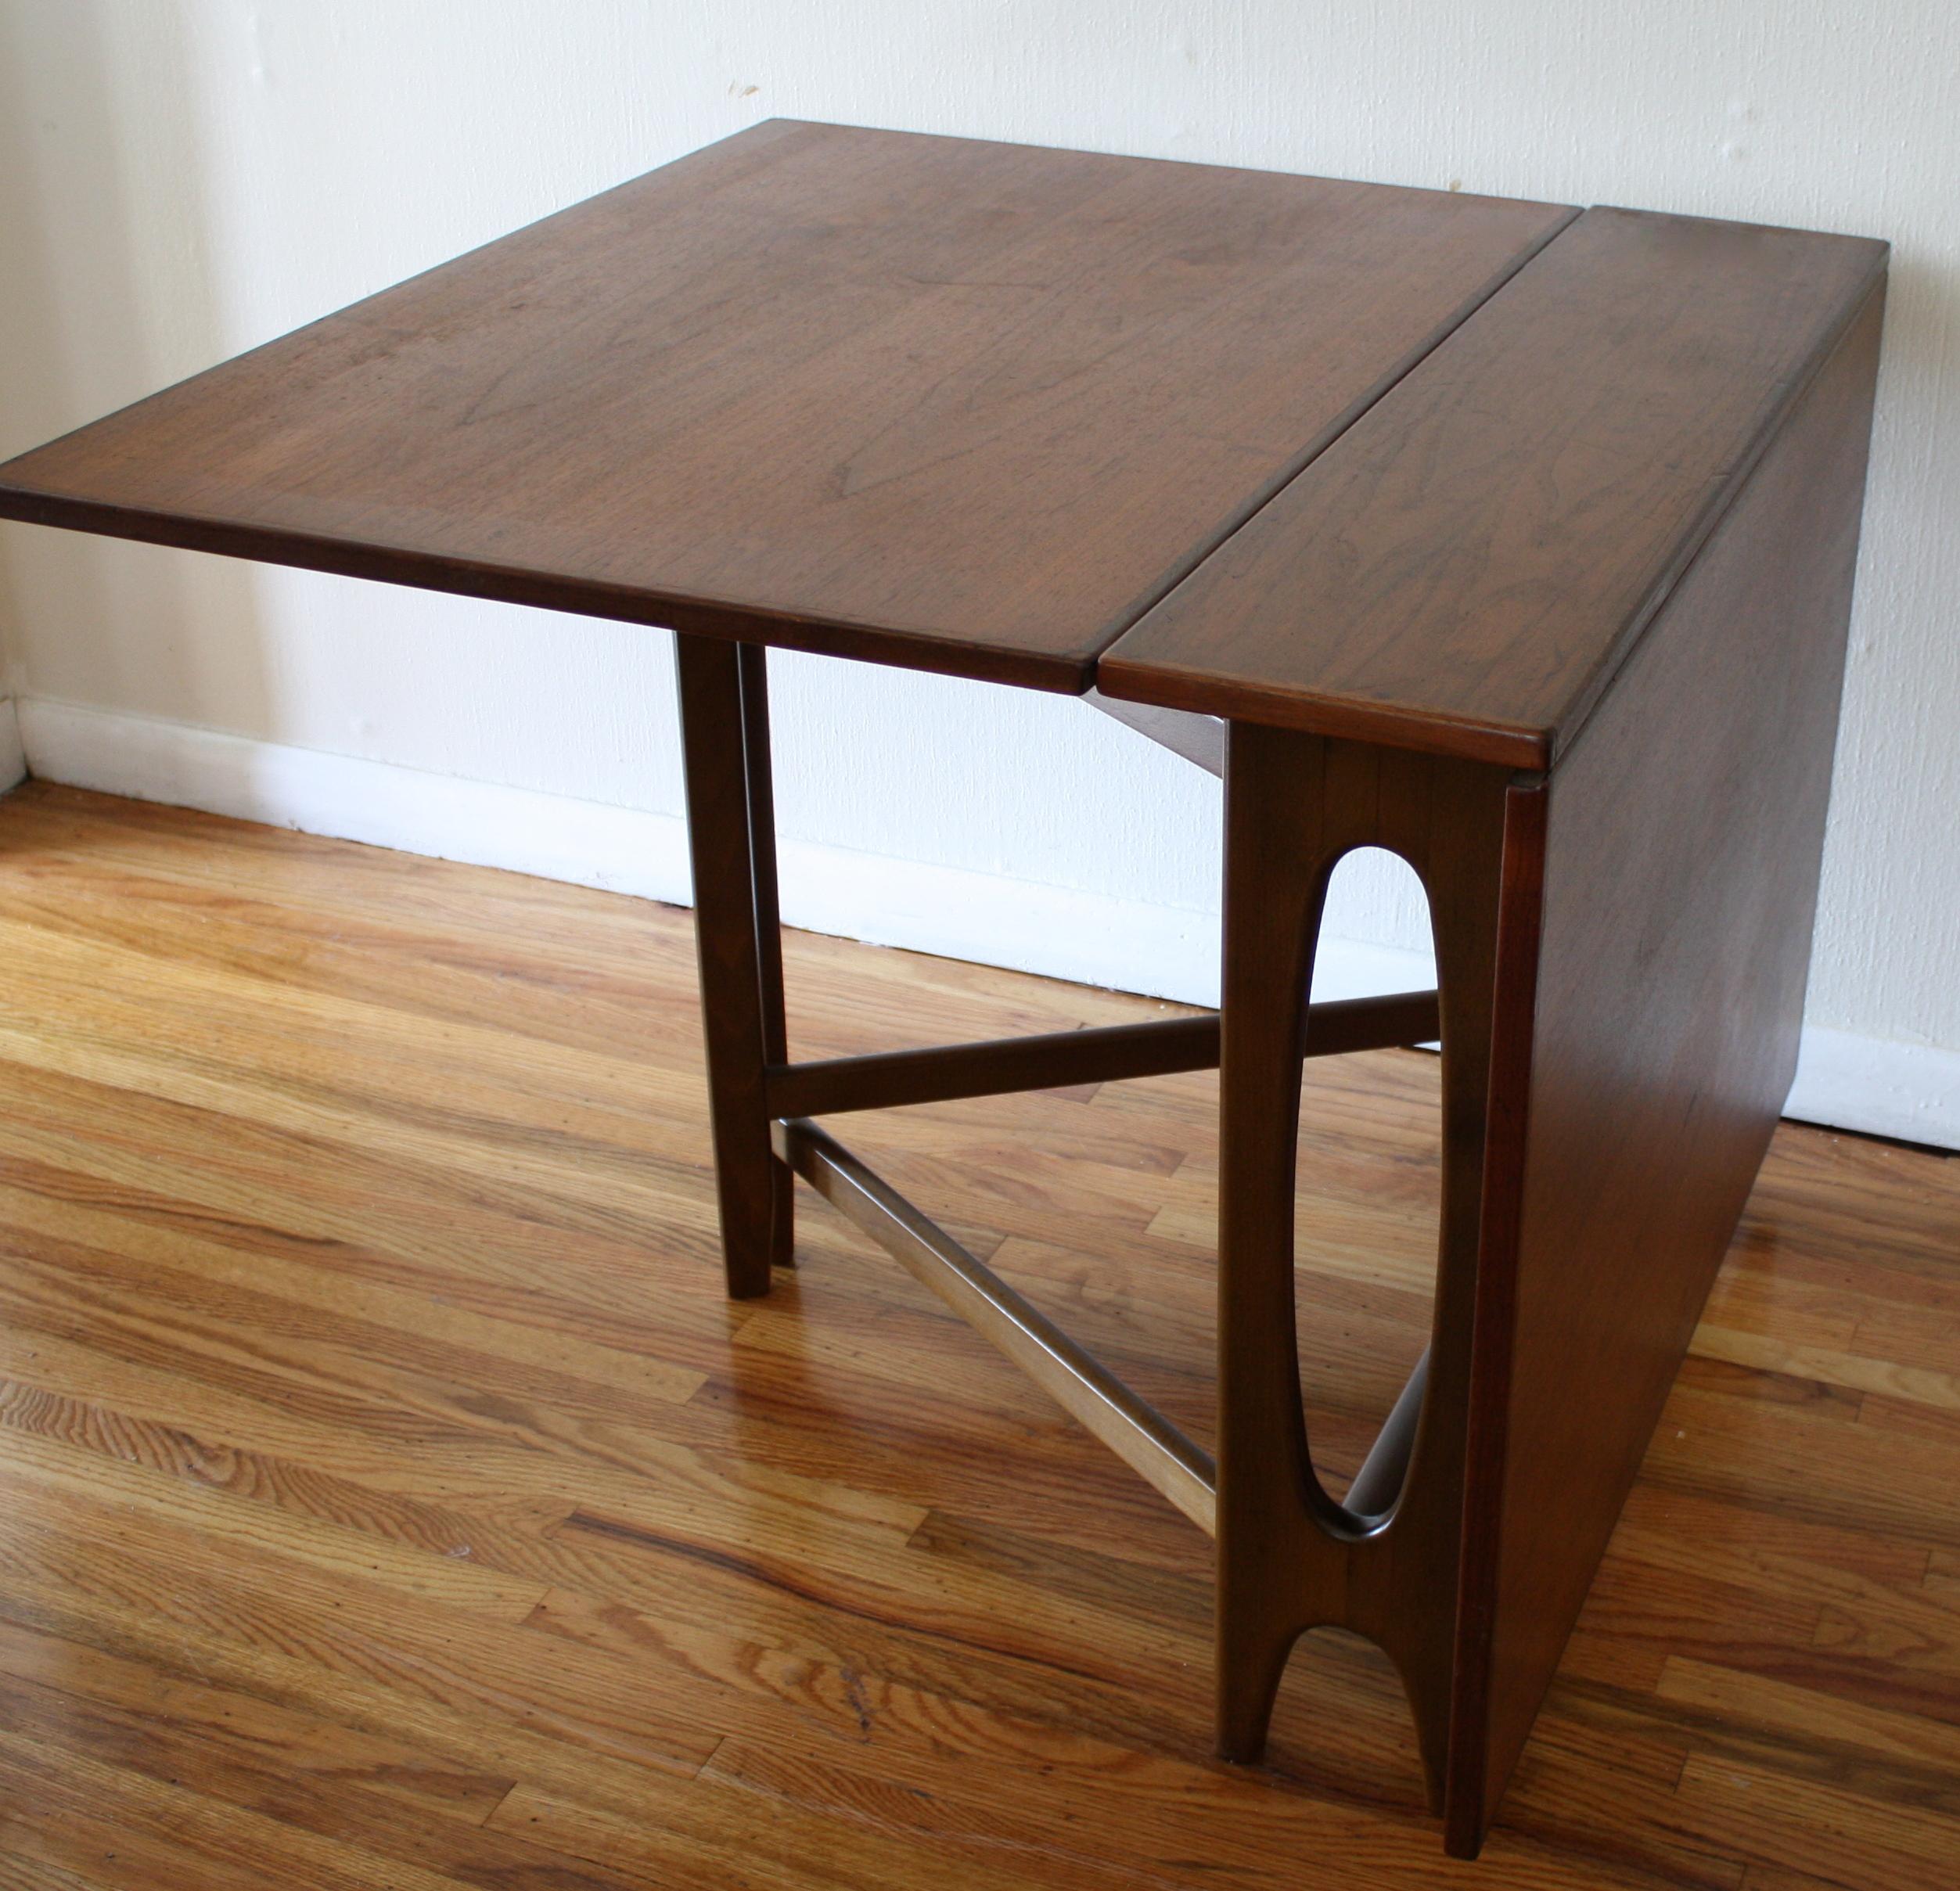 folding kitchen tables backsplash tile design ideas dining table videos